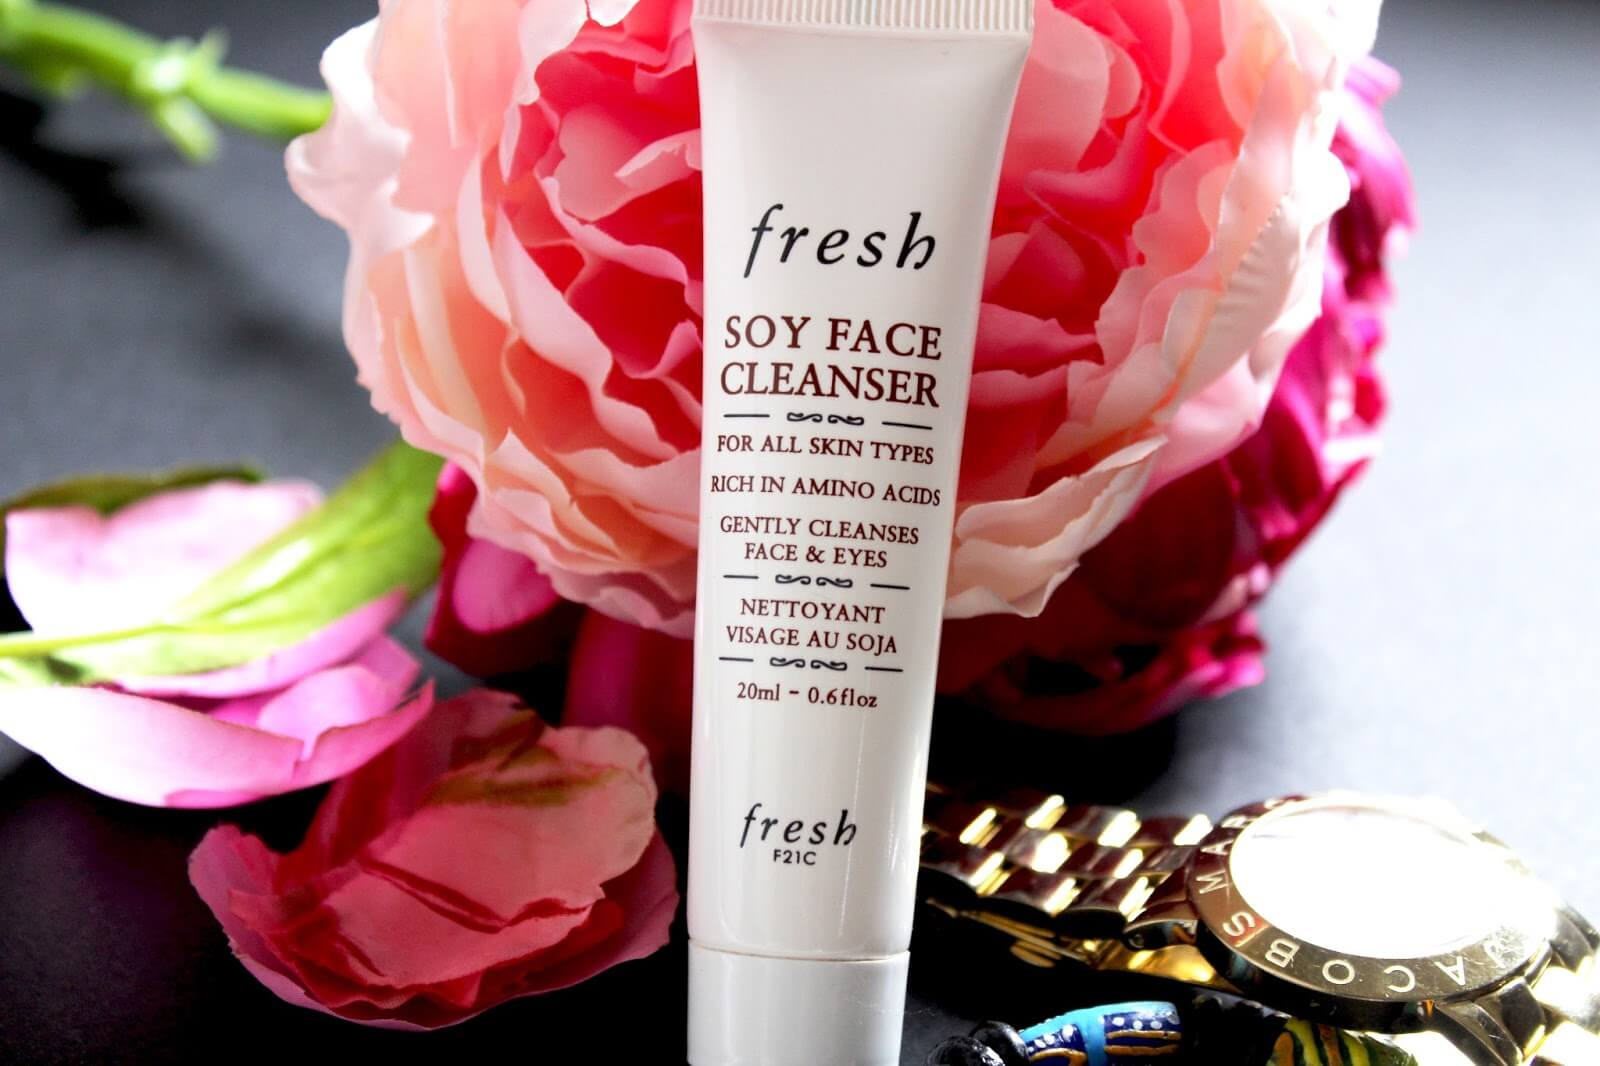 Fresh Soy Face Cleanser 50 mlเจลล้างหน้าที่มีความอ่อนโยน ใช้ได้กับทุกสภาพผิว ชำระล้างสิ่งสกปรกที่ตกค้างบนใบหน้ารวมทั้งเมคอัพ